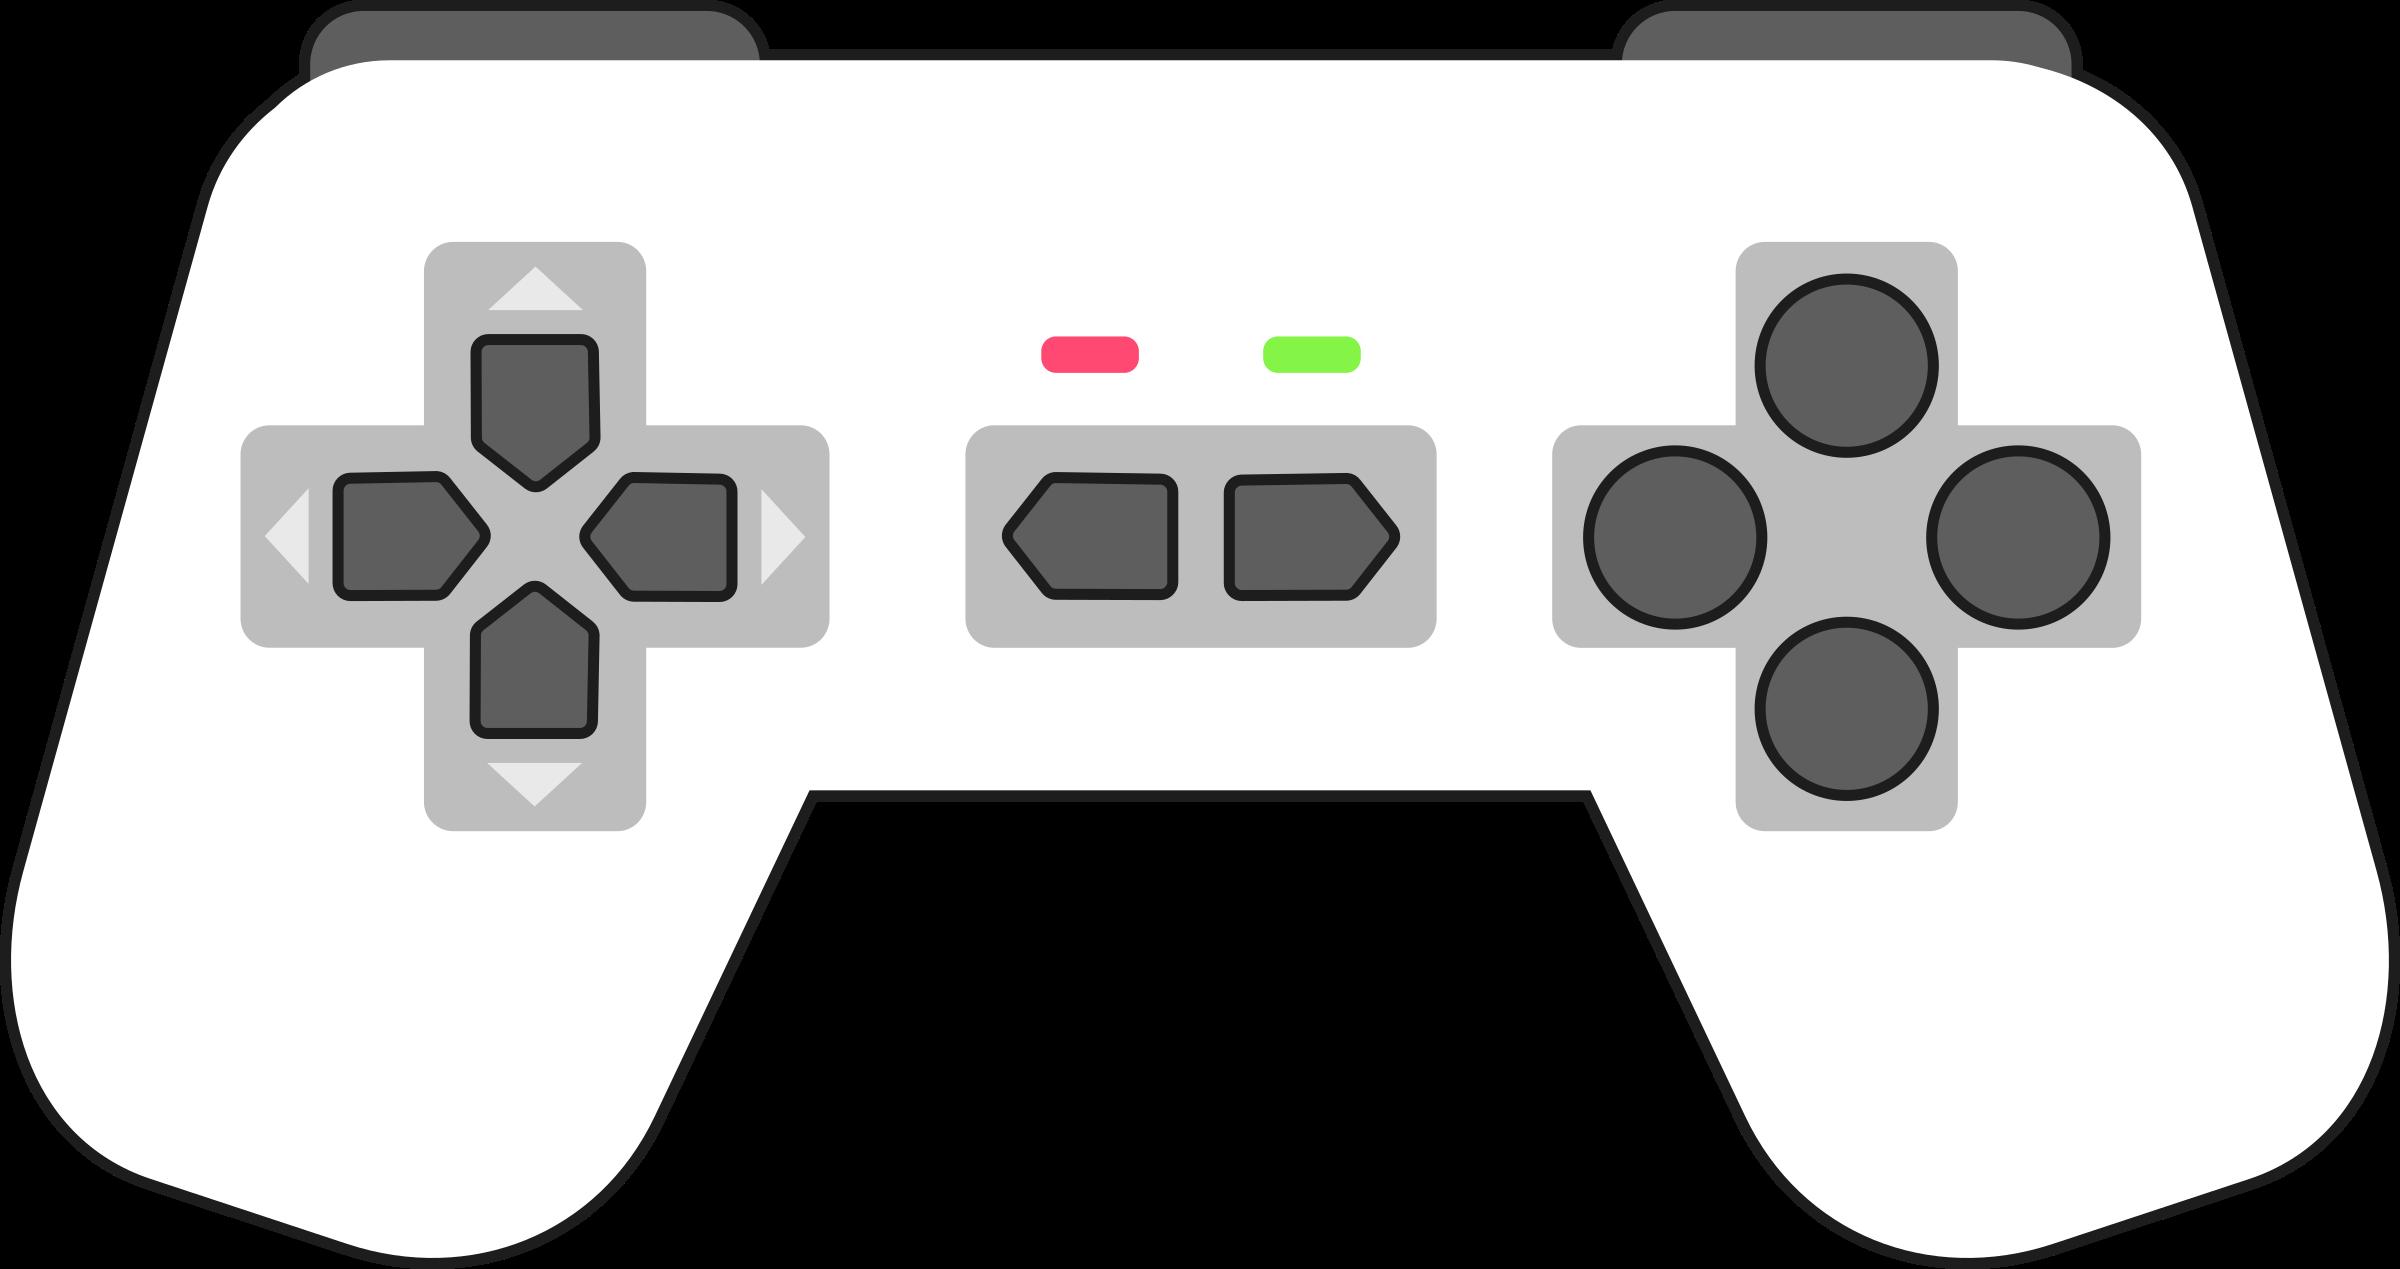 Game clipart game pad. Gamepad white